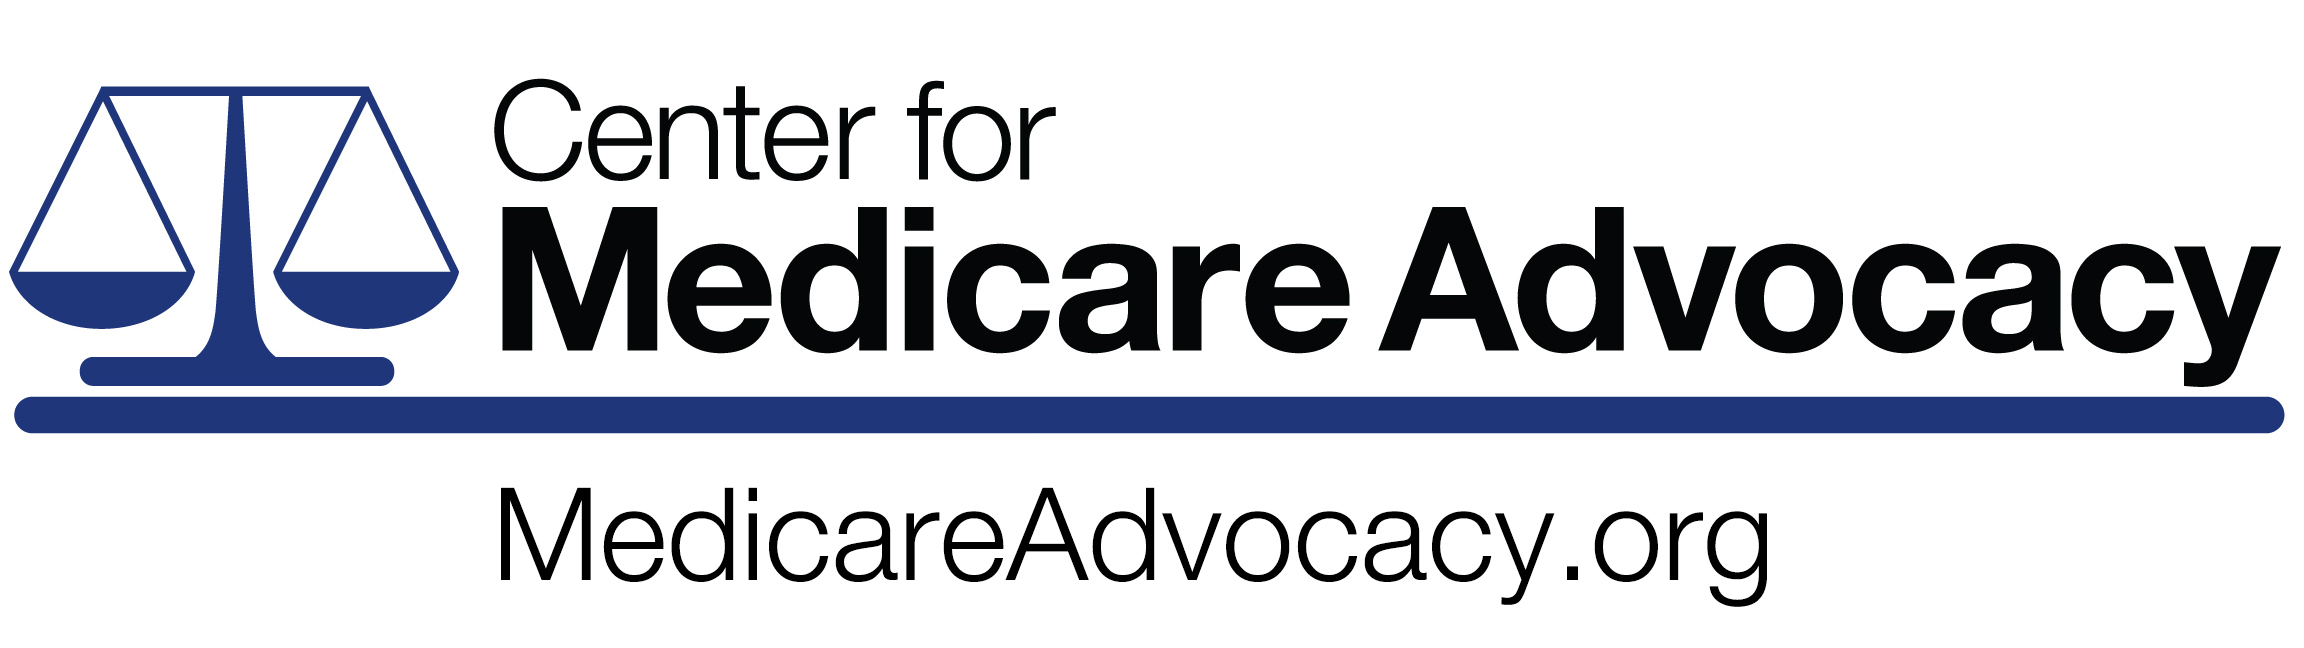 CMA Alert – January 3, 2019 | Center for Medicare Advocacy